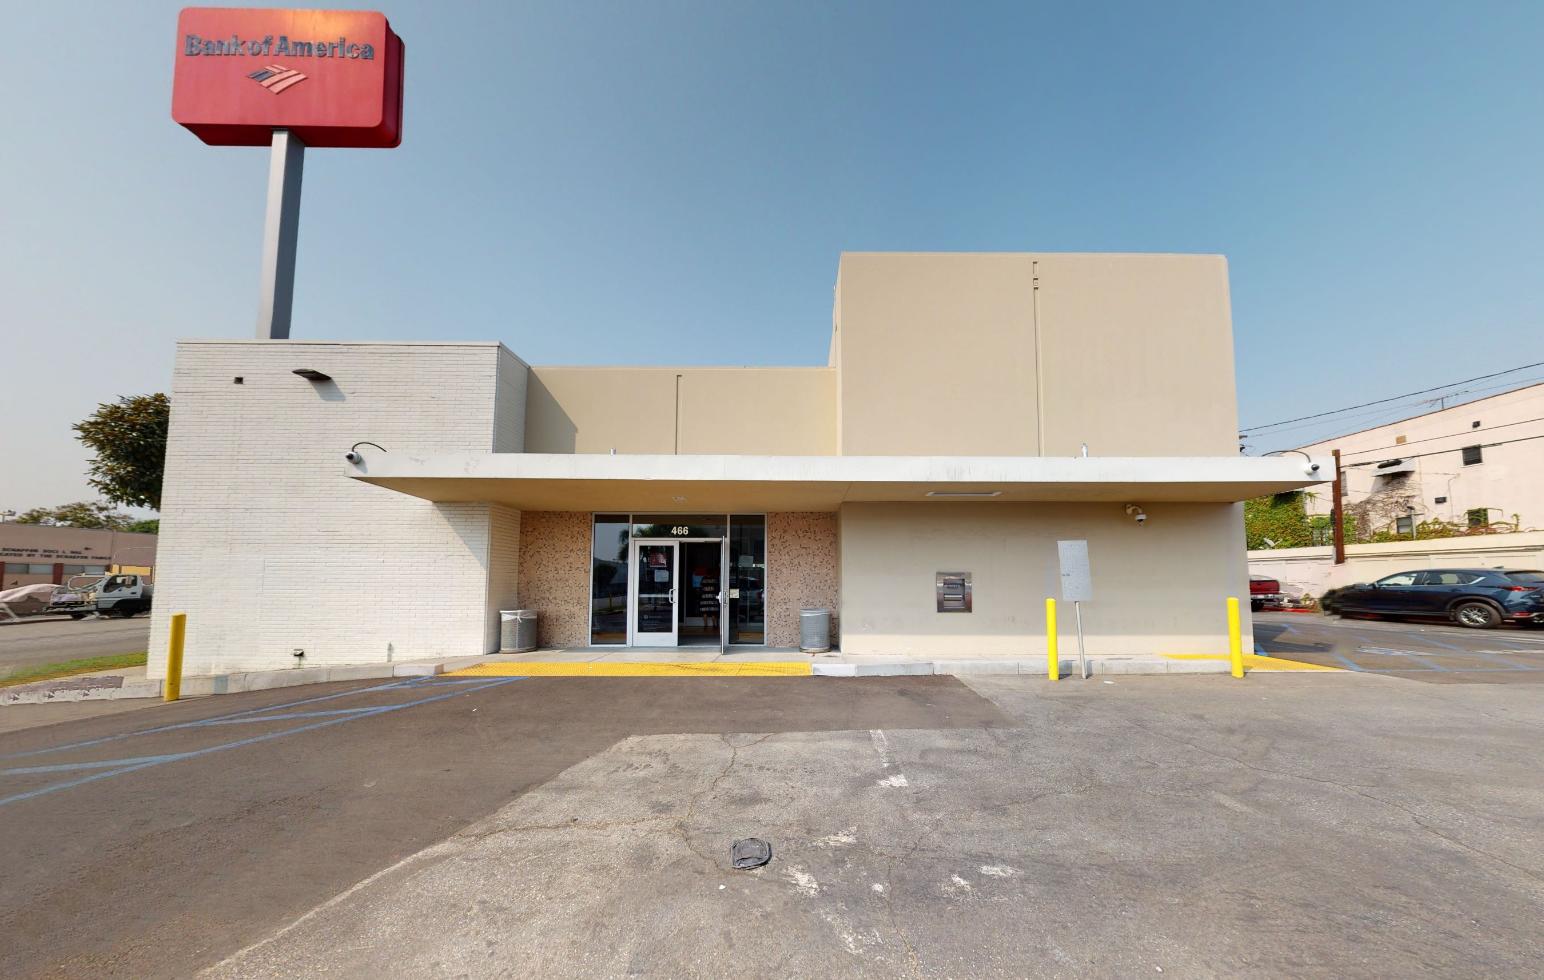 Bank of America financial center with walk-up ATM   466 N La Brea Ave, Los Angeles, CA 90036